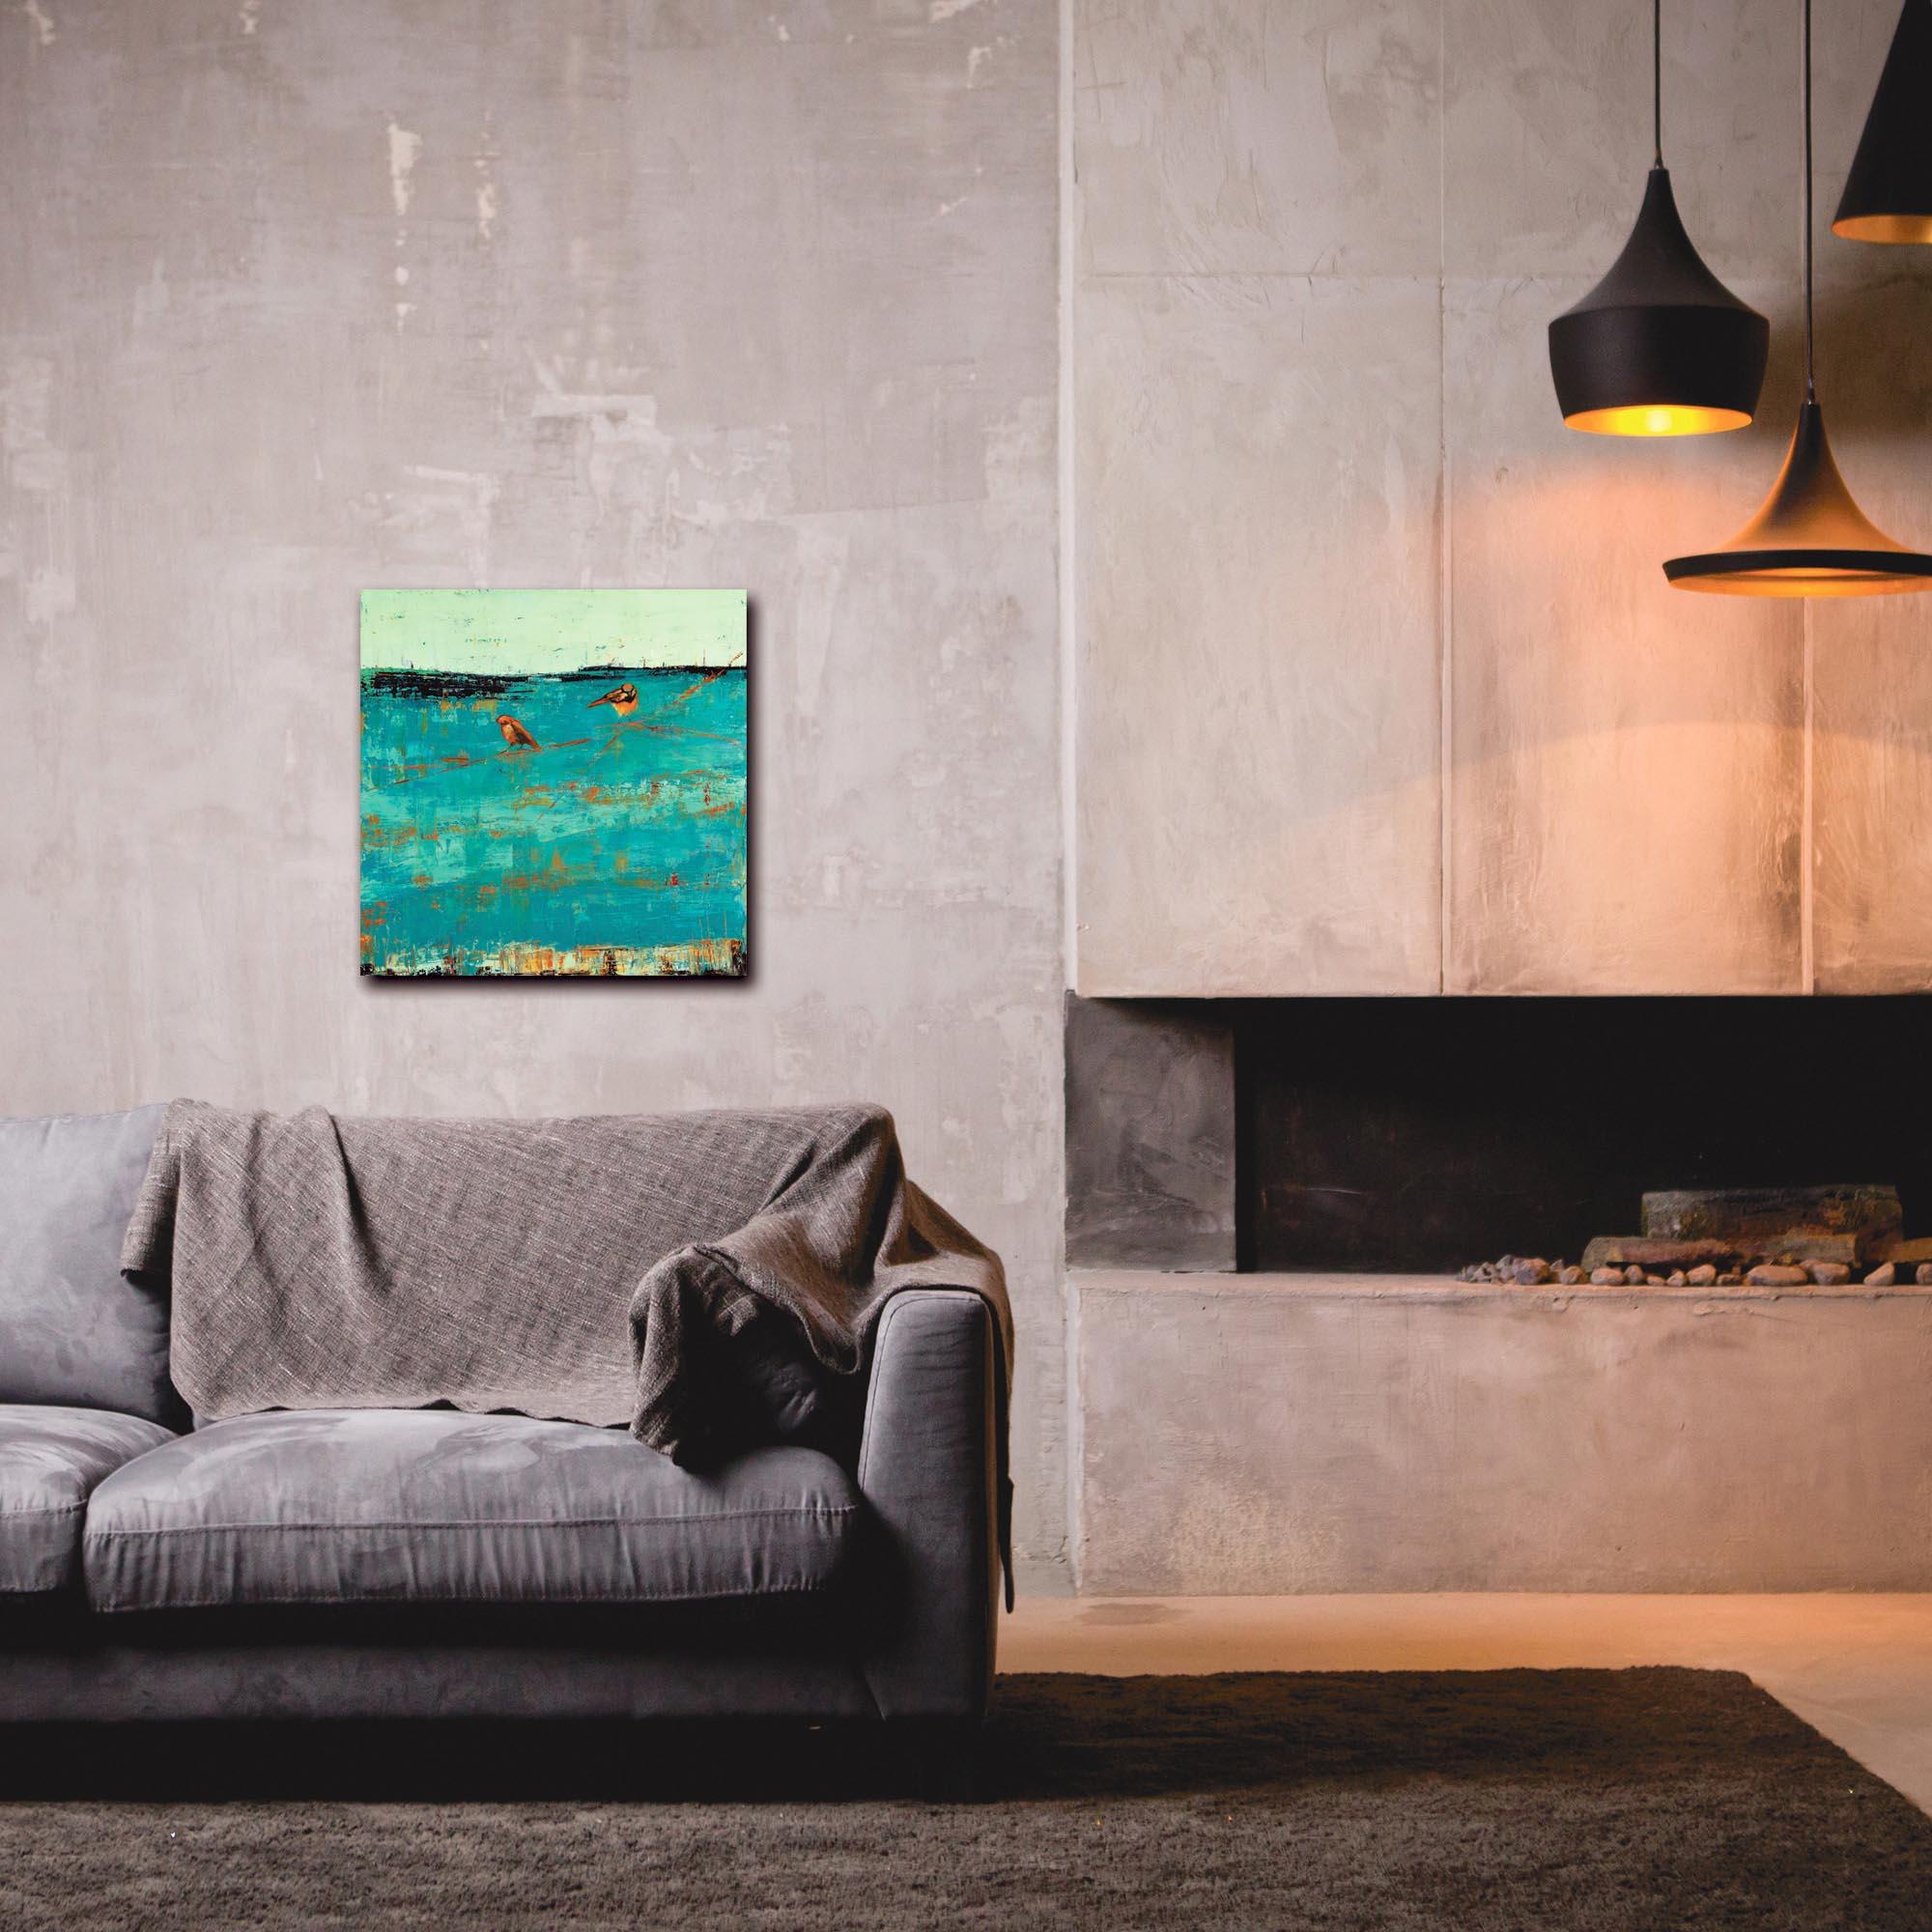 Contemporary Wall Art 'Two Chickadees on a Blue Horizon' - Urban Birds Decor on Metal or Plexiglass - Lifestyle View